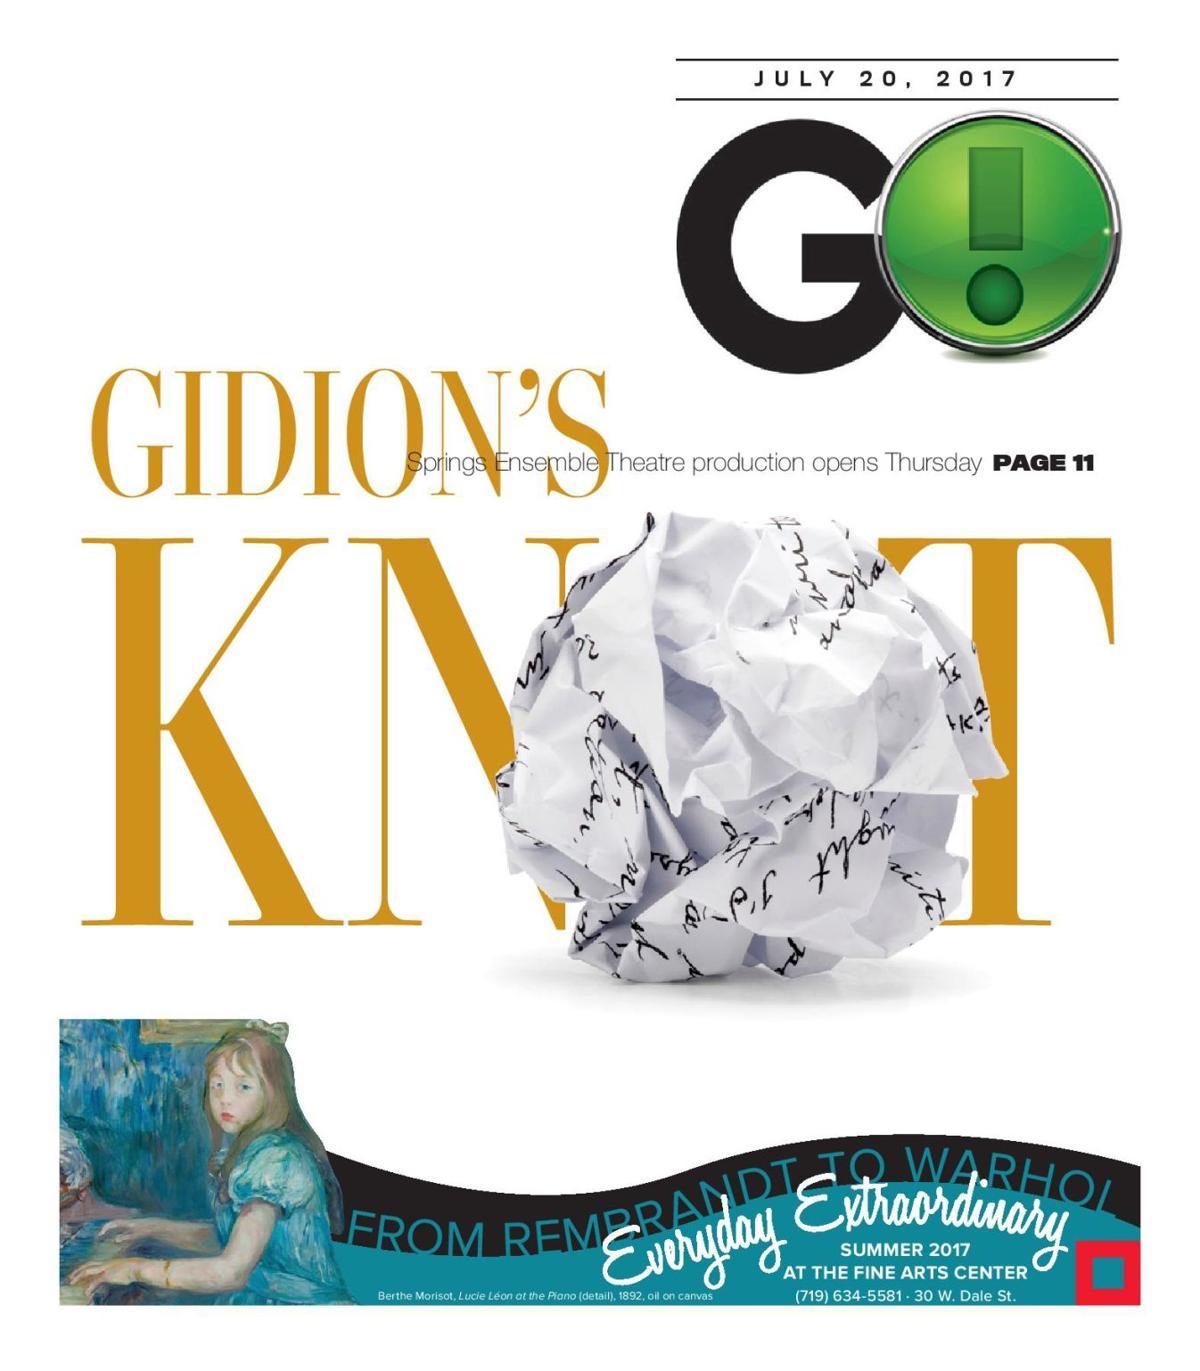 Talking With Gazette News Partner Kktv 11 News About This Week S Go